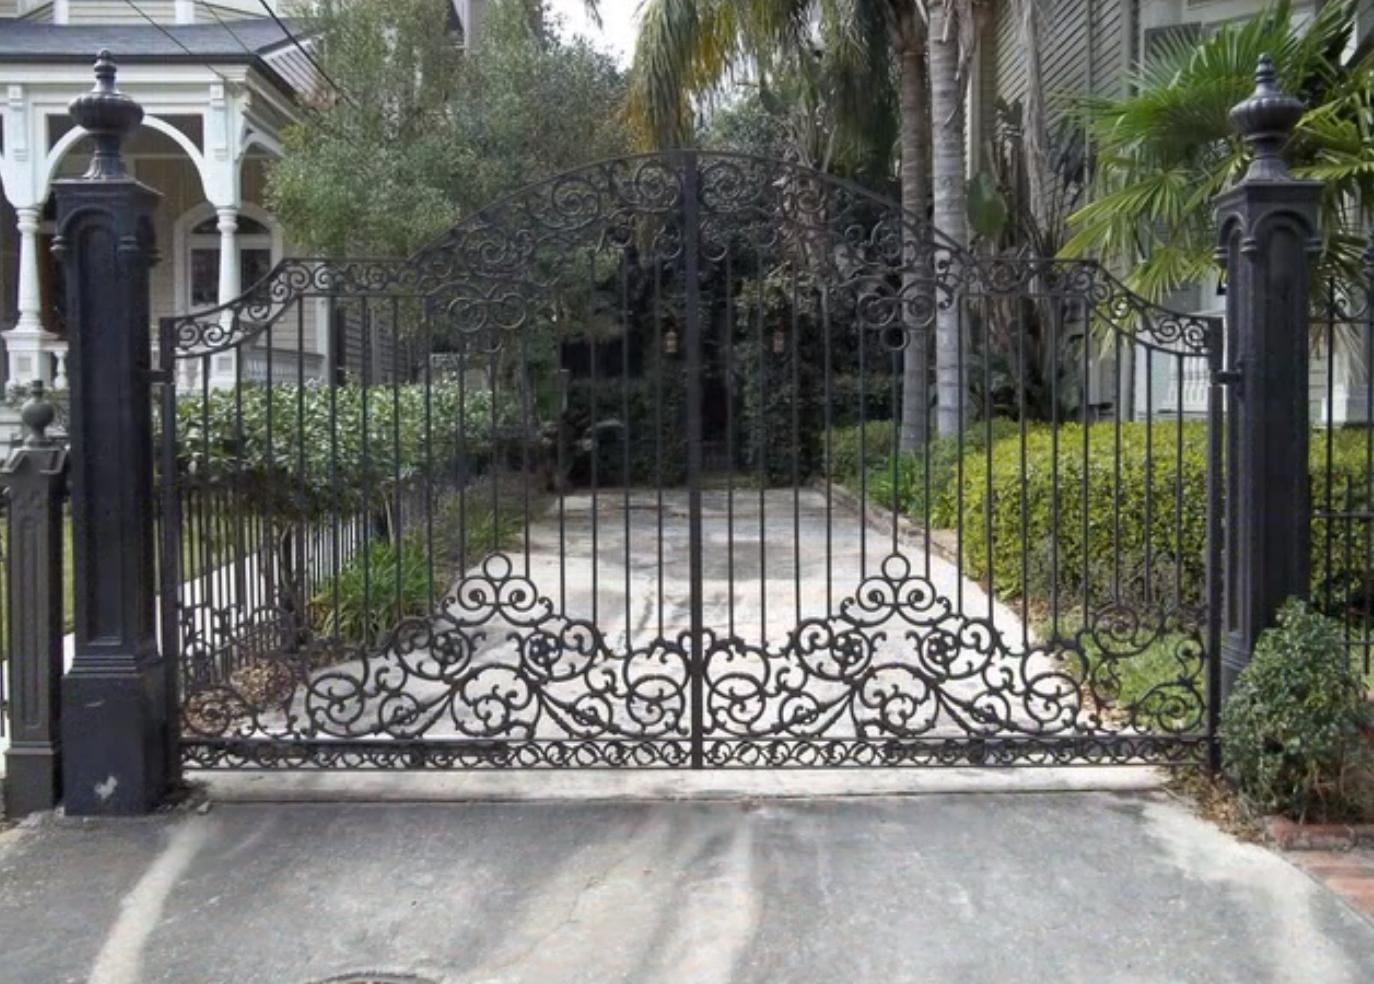 Best 25 Wrought iron driveway gates ideas on Pinterest Iron